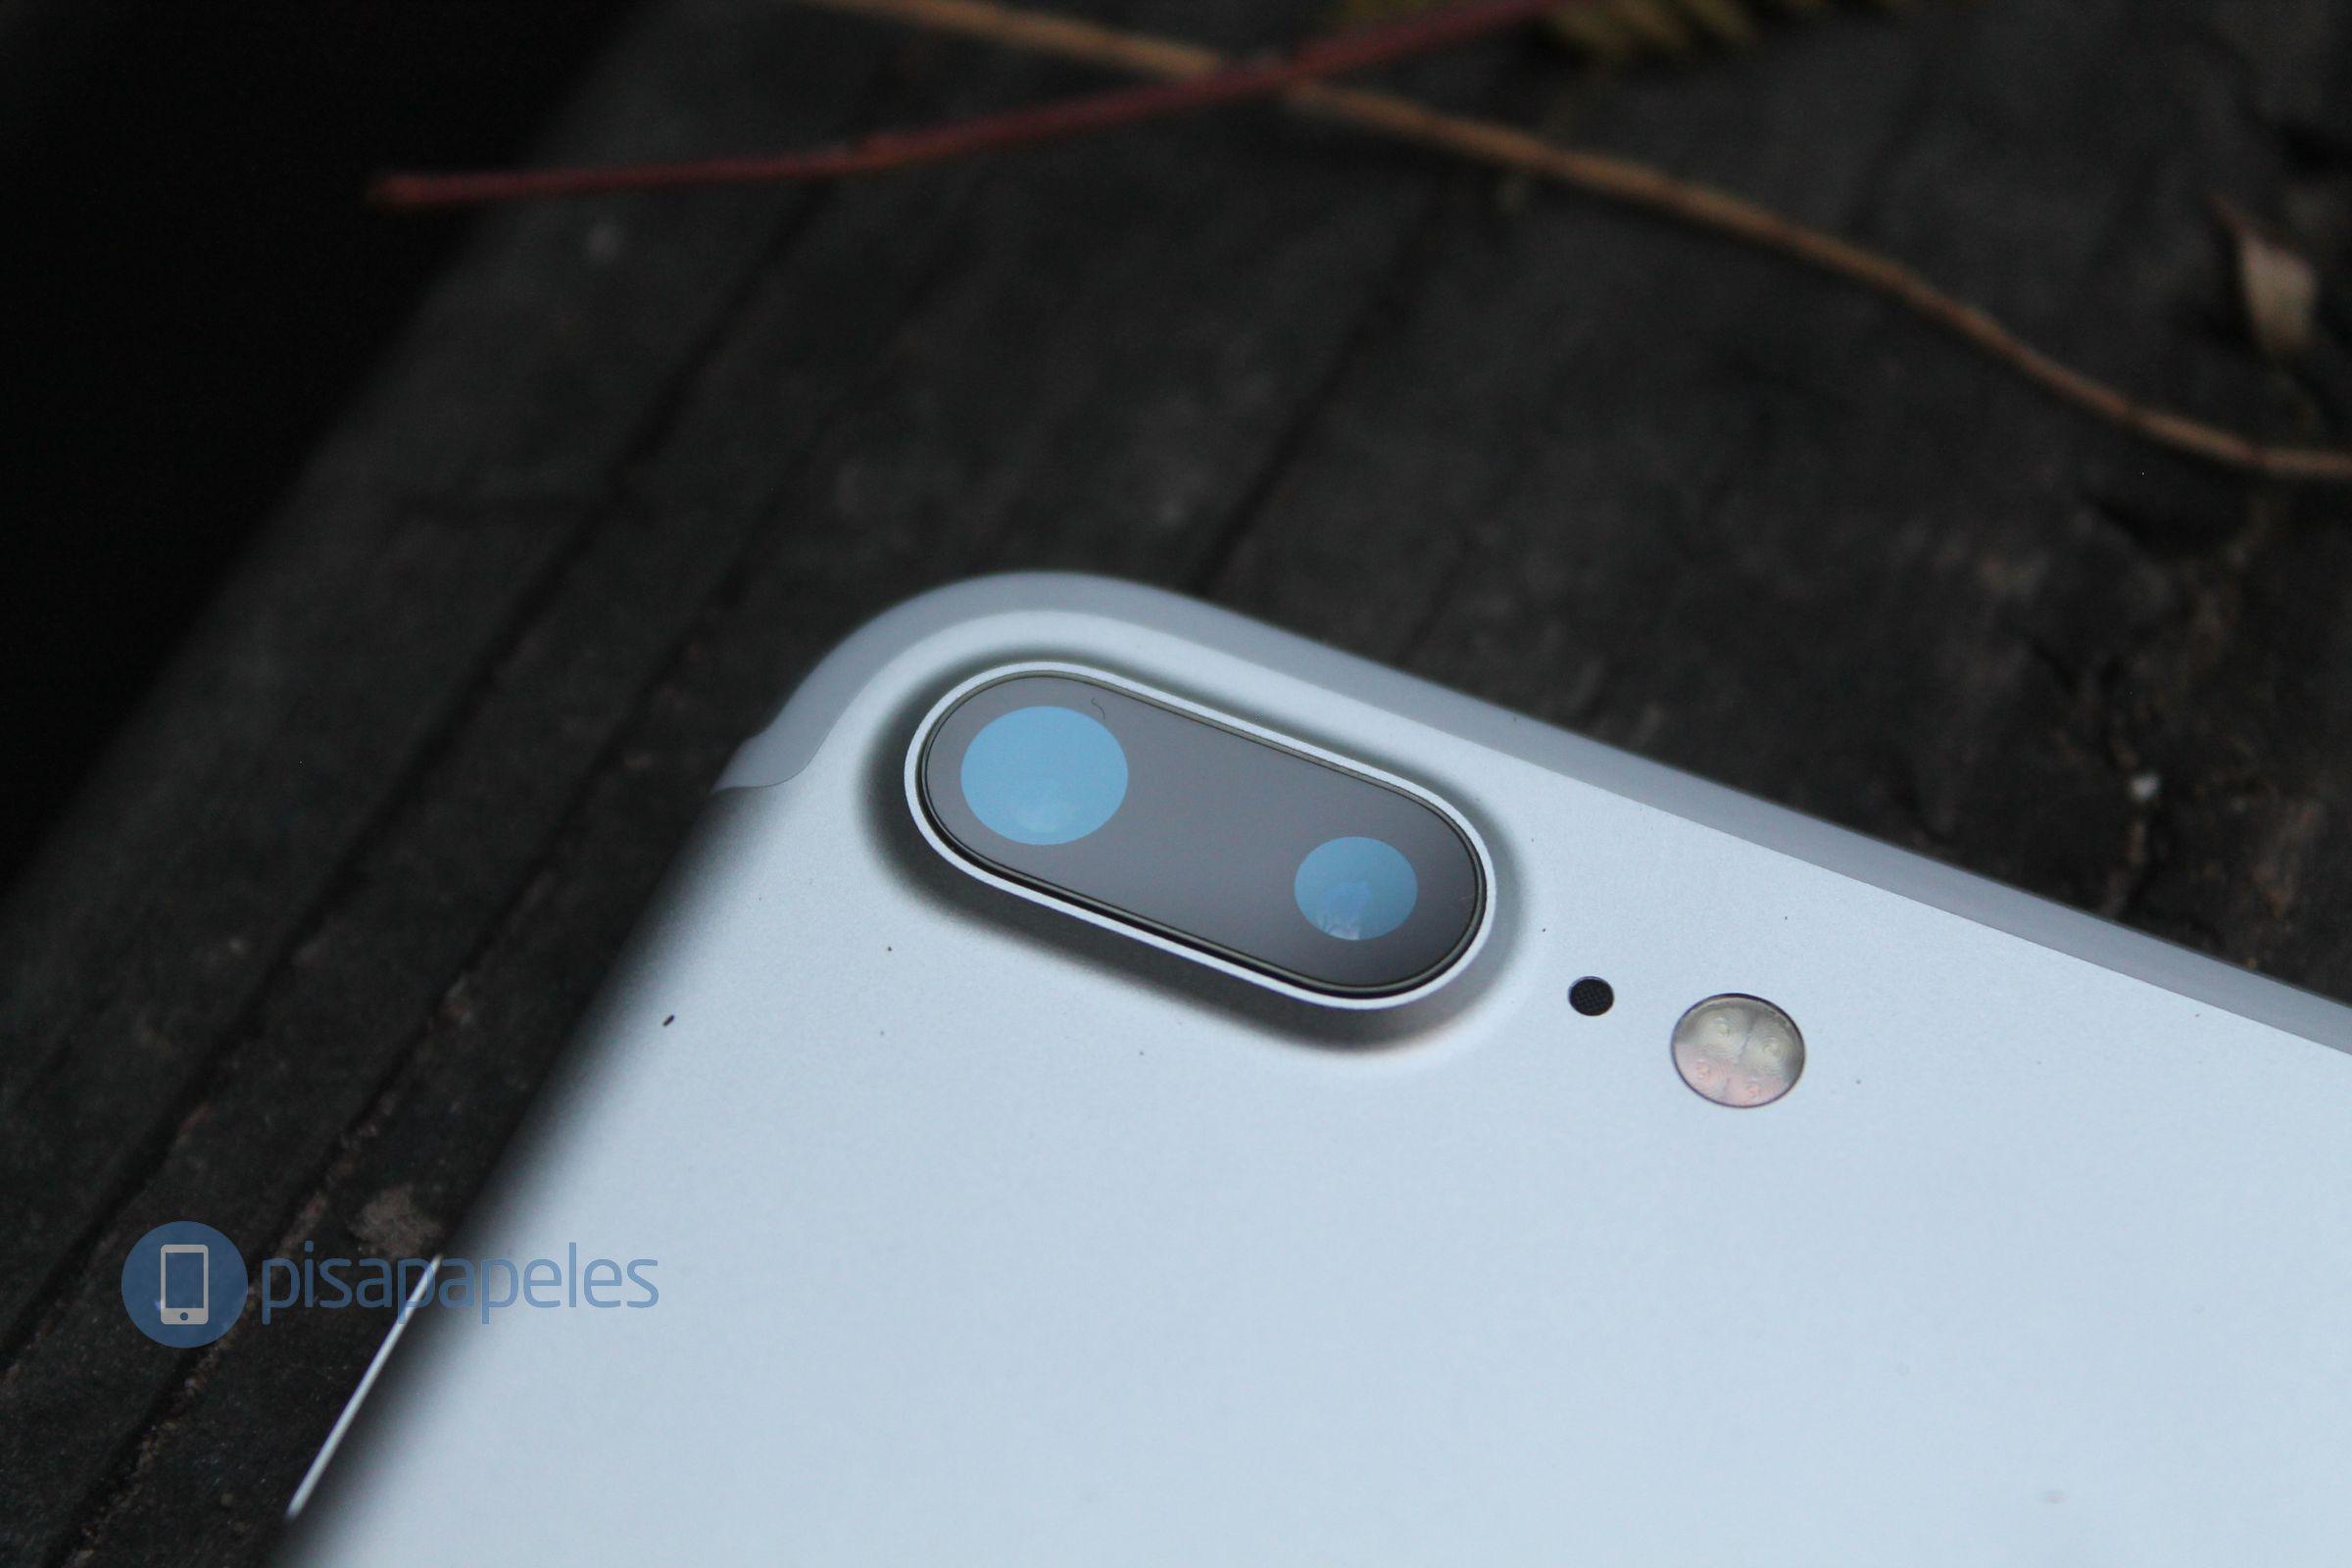 apple-iphone-7-plus-pisapapeles-net_43